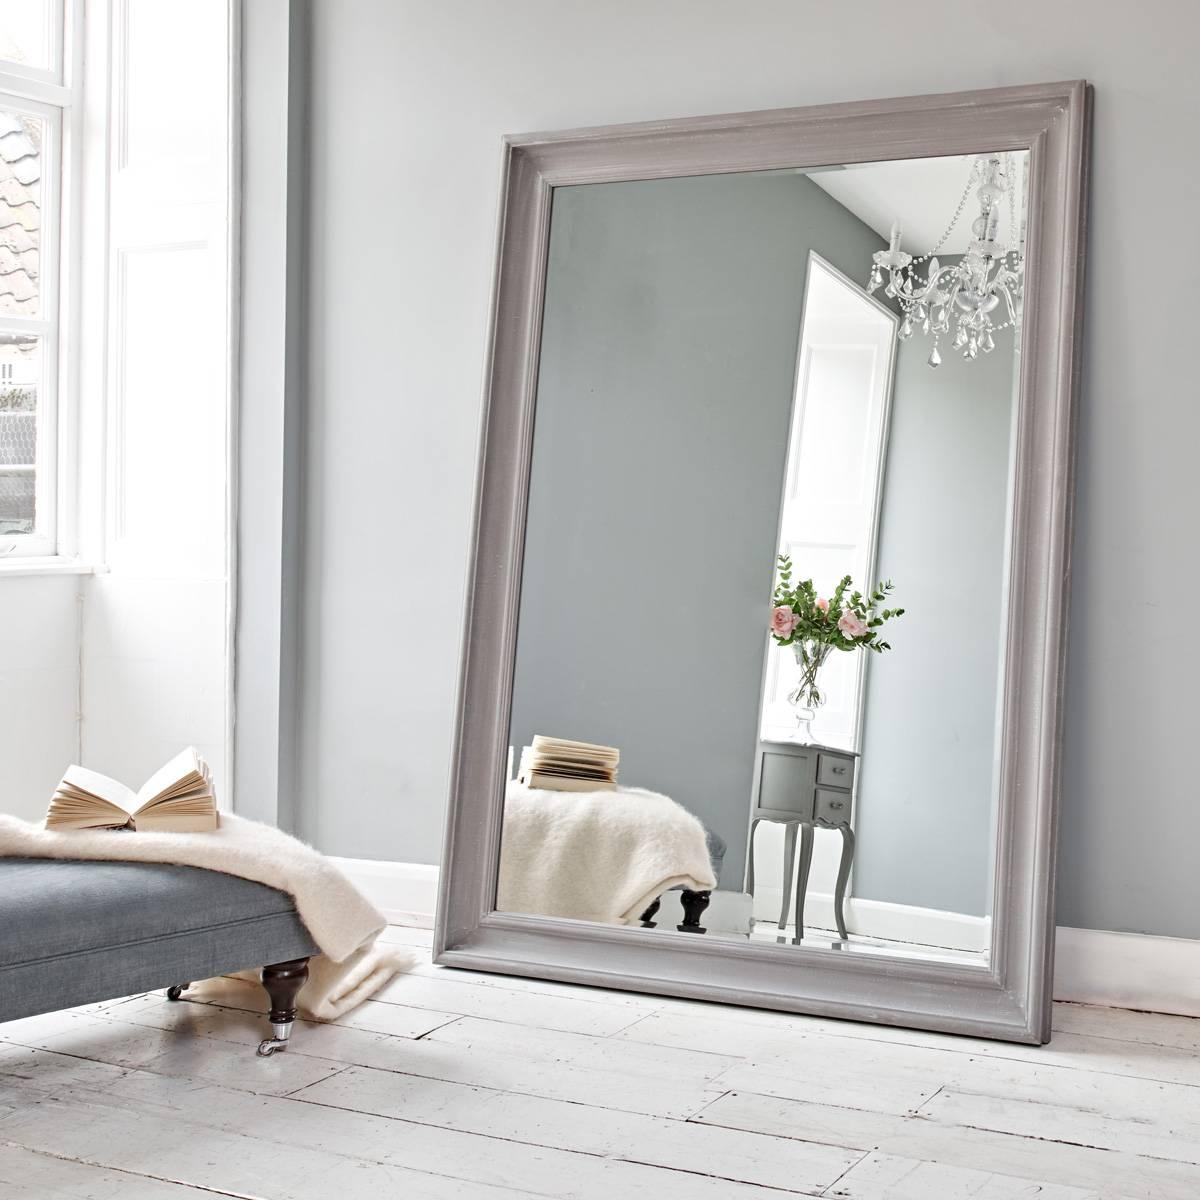 Vermont Oversized Mirror – Danish Grey | Brissi With Regard To Oversized Mirrors (View 14 of 15)